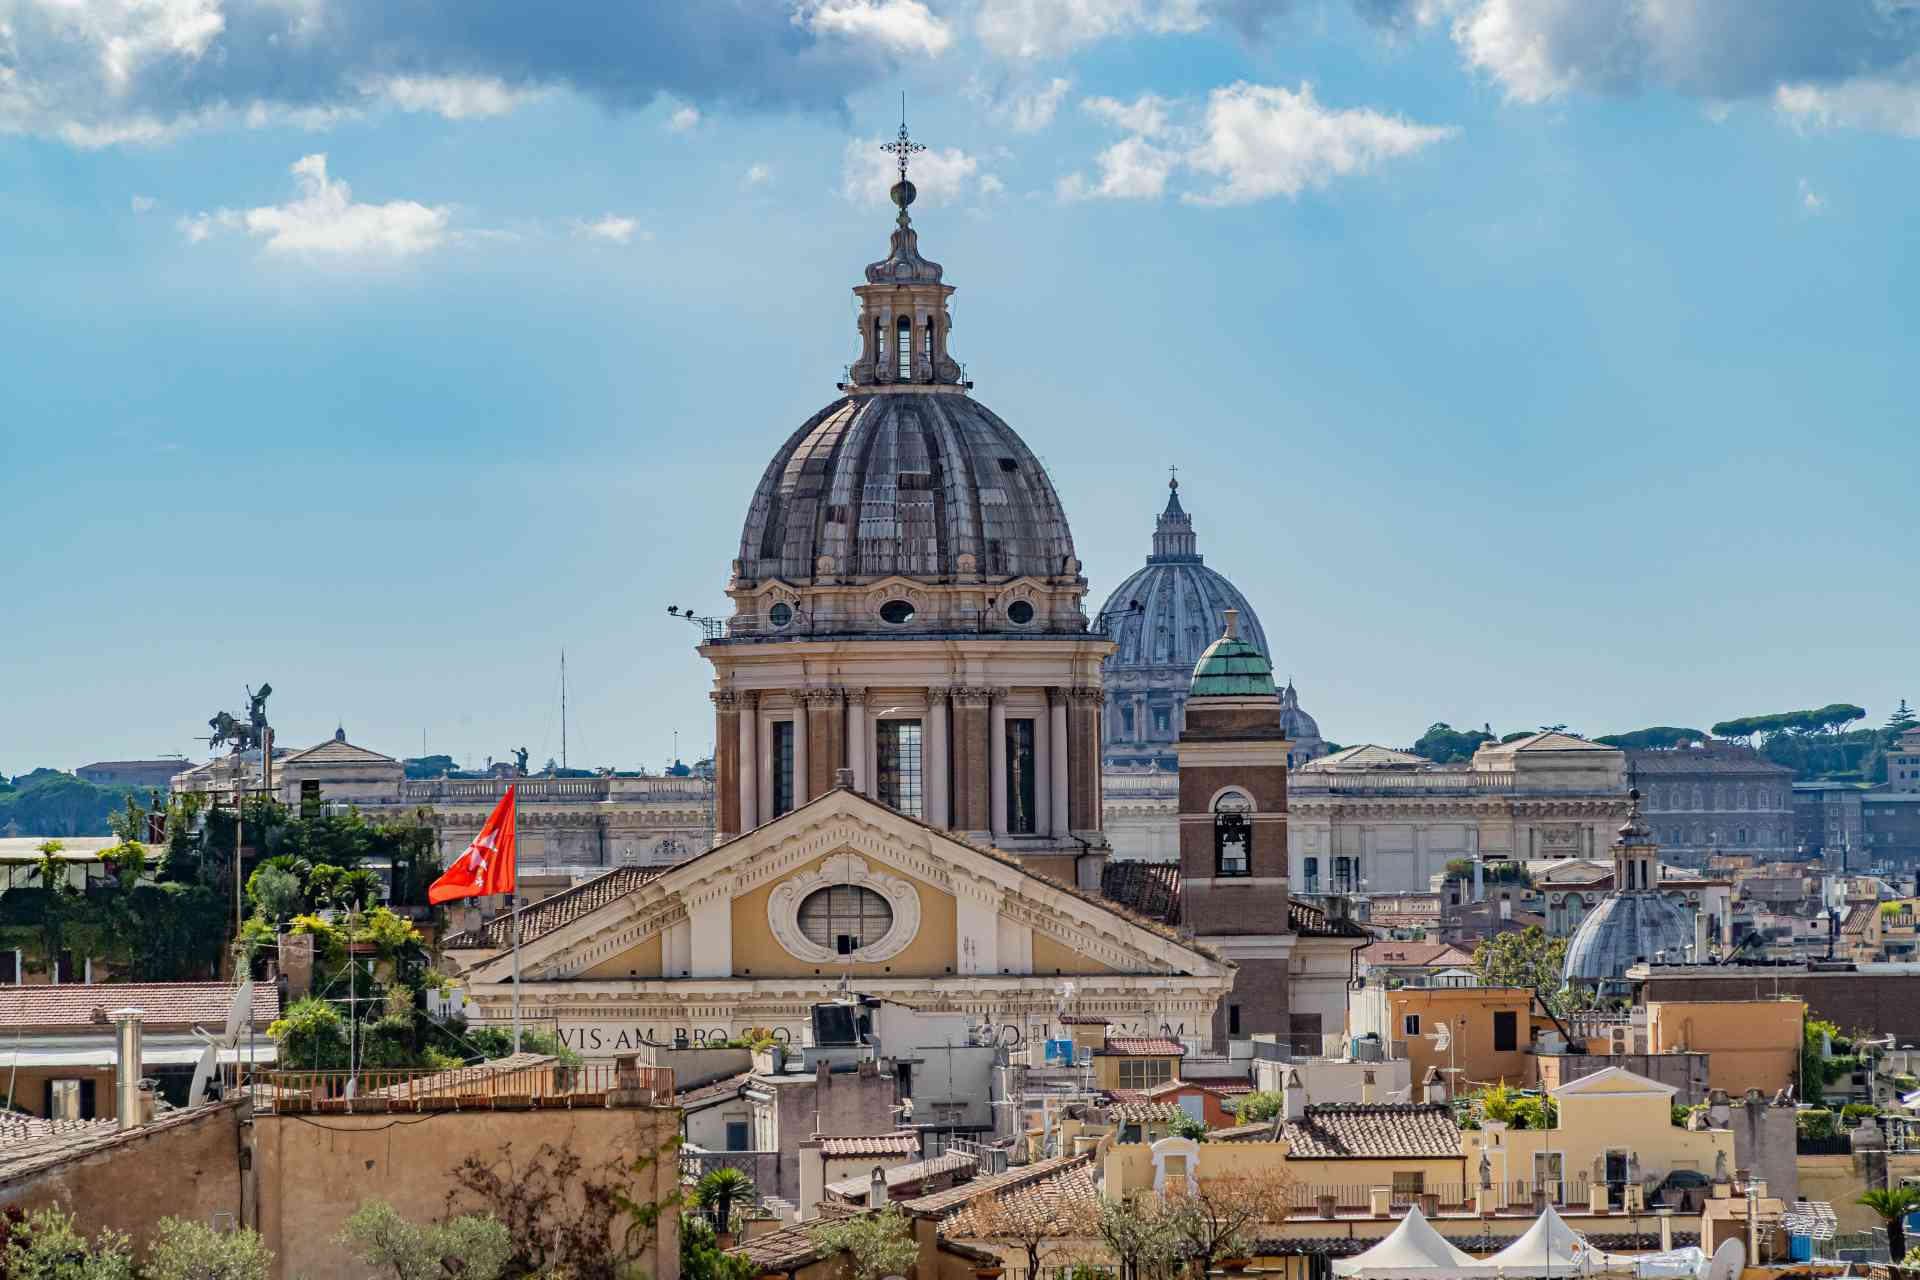 Rome, Italy by Mirza Ariadi